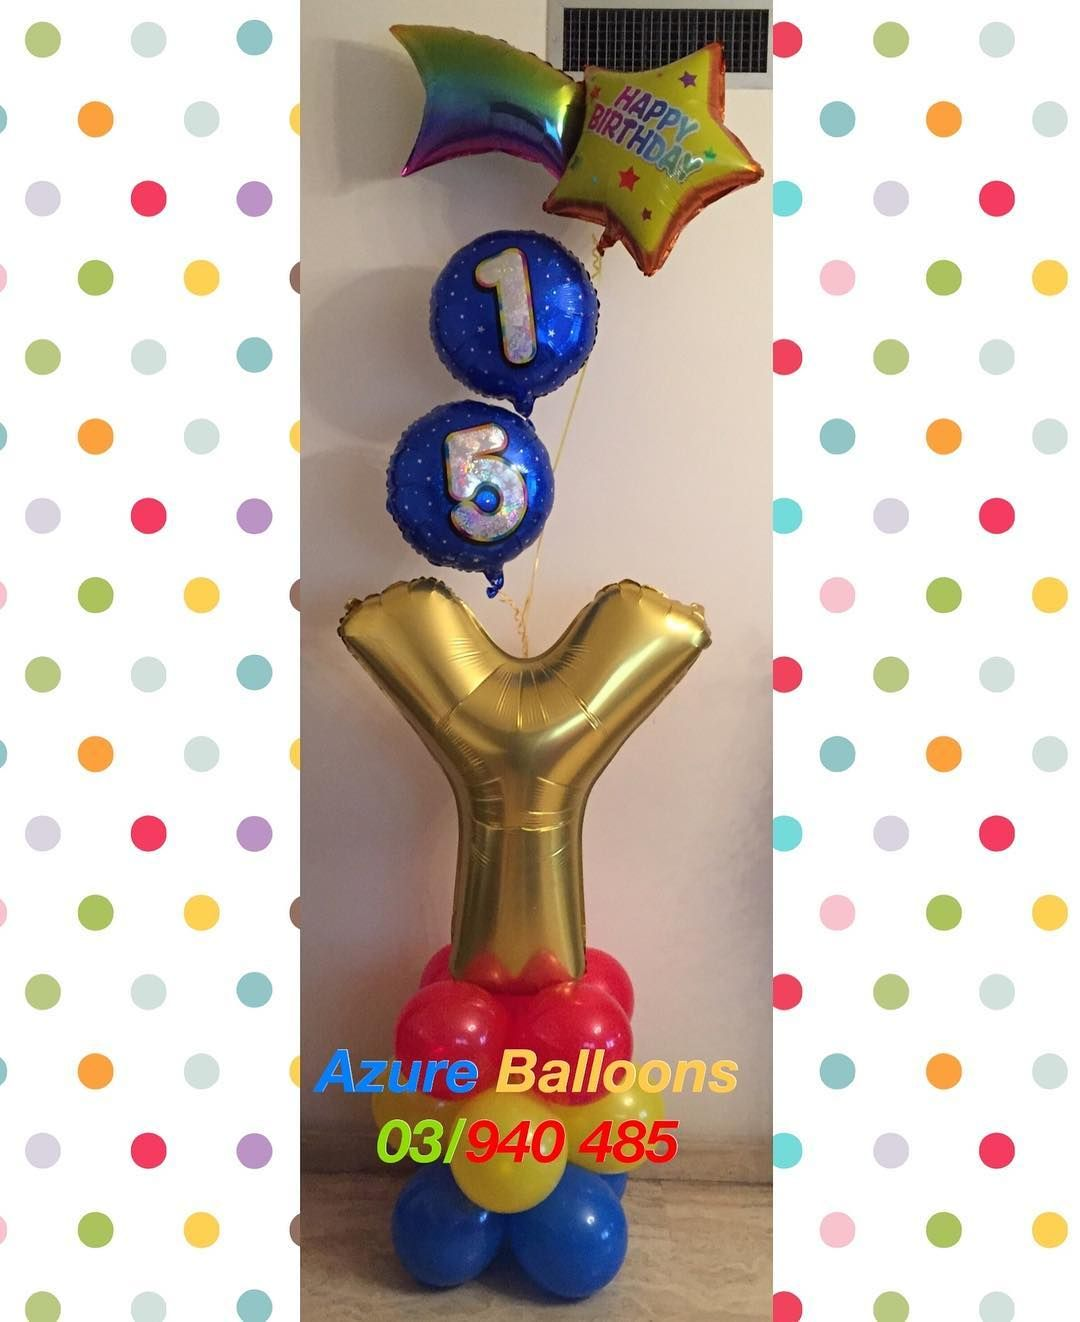 Azure Balloons03 940 485 On Instagram Call Whatsapp 03 Happy 15th Birthday Yousef Birthdayballoons Balloonarrangement Letterballoon